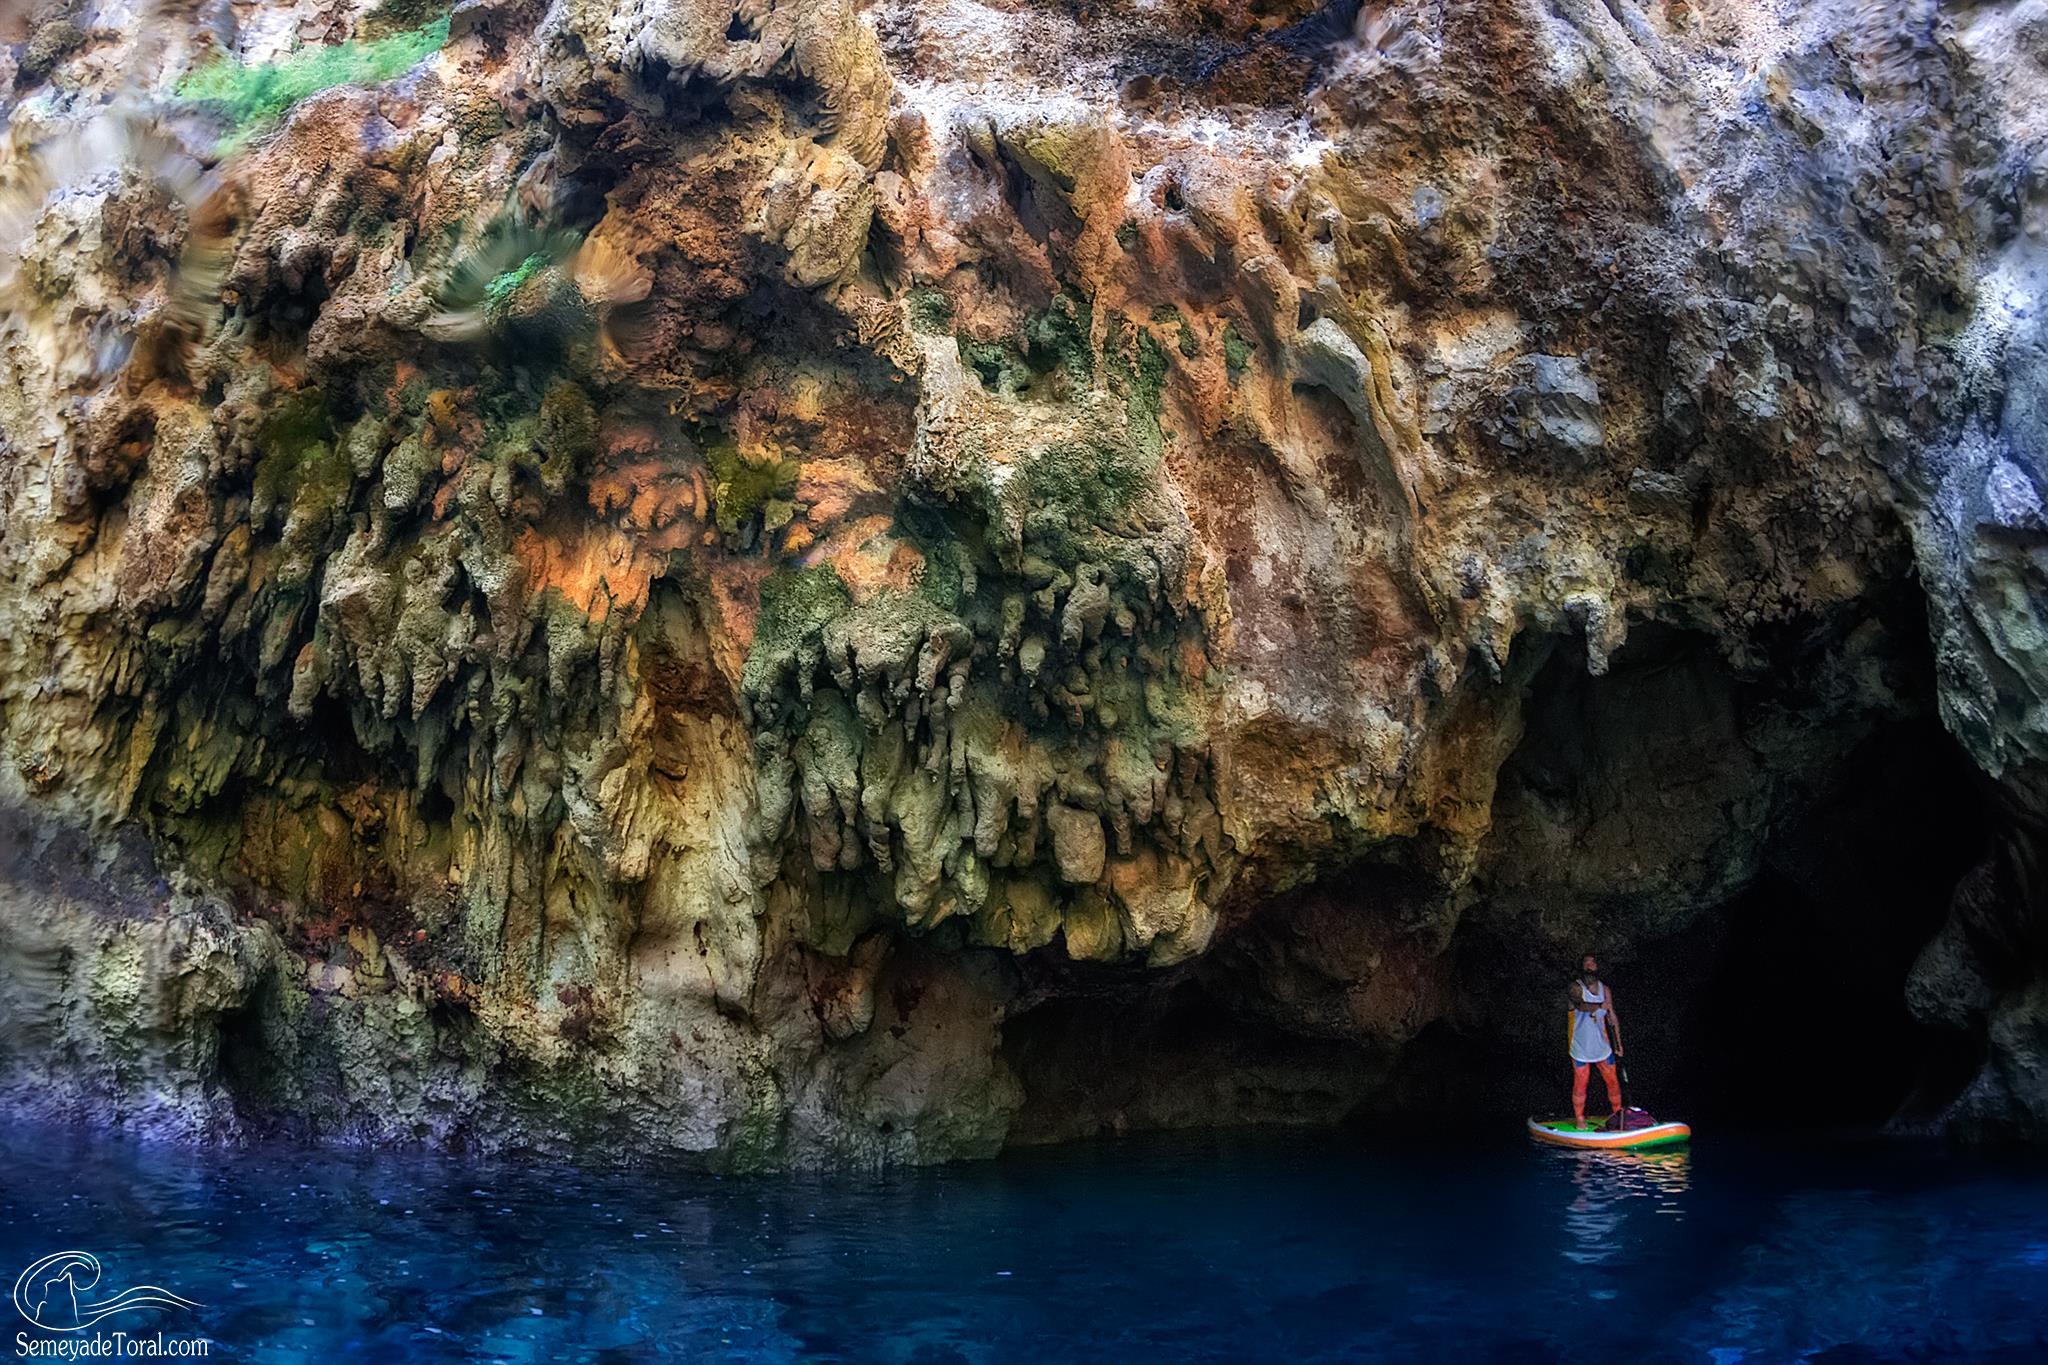 Colores kársticos  - STAND UP PADDLE SURF - Semeya  de Toral